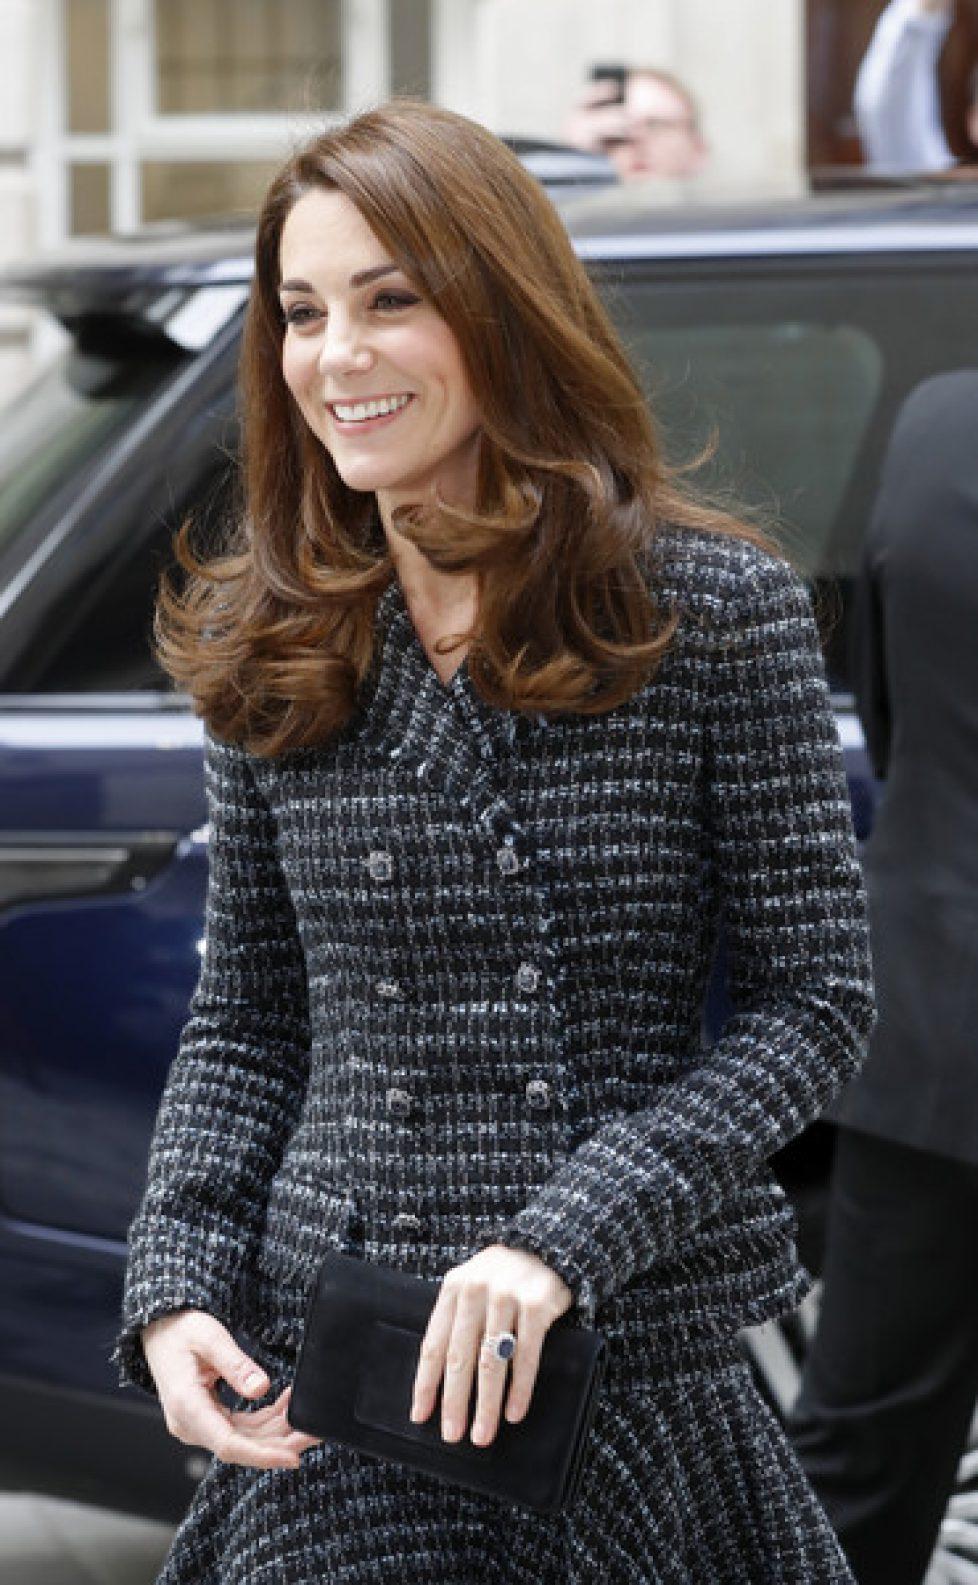 Duchess+Cambridge+Attends+Mental+Health+Education+5tjQlCQkd7El